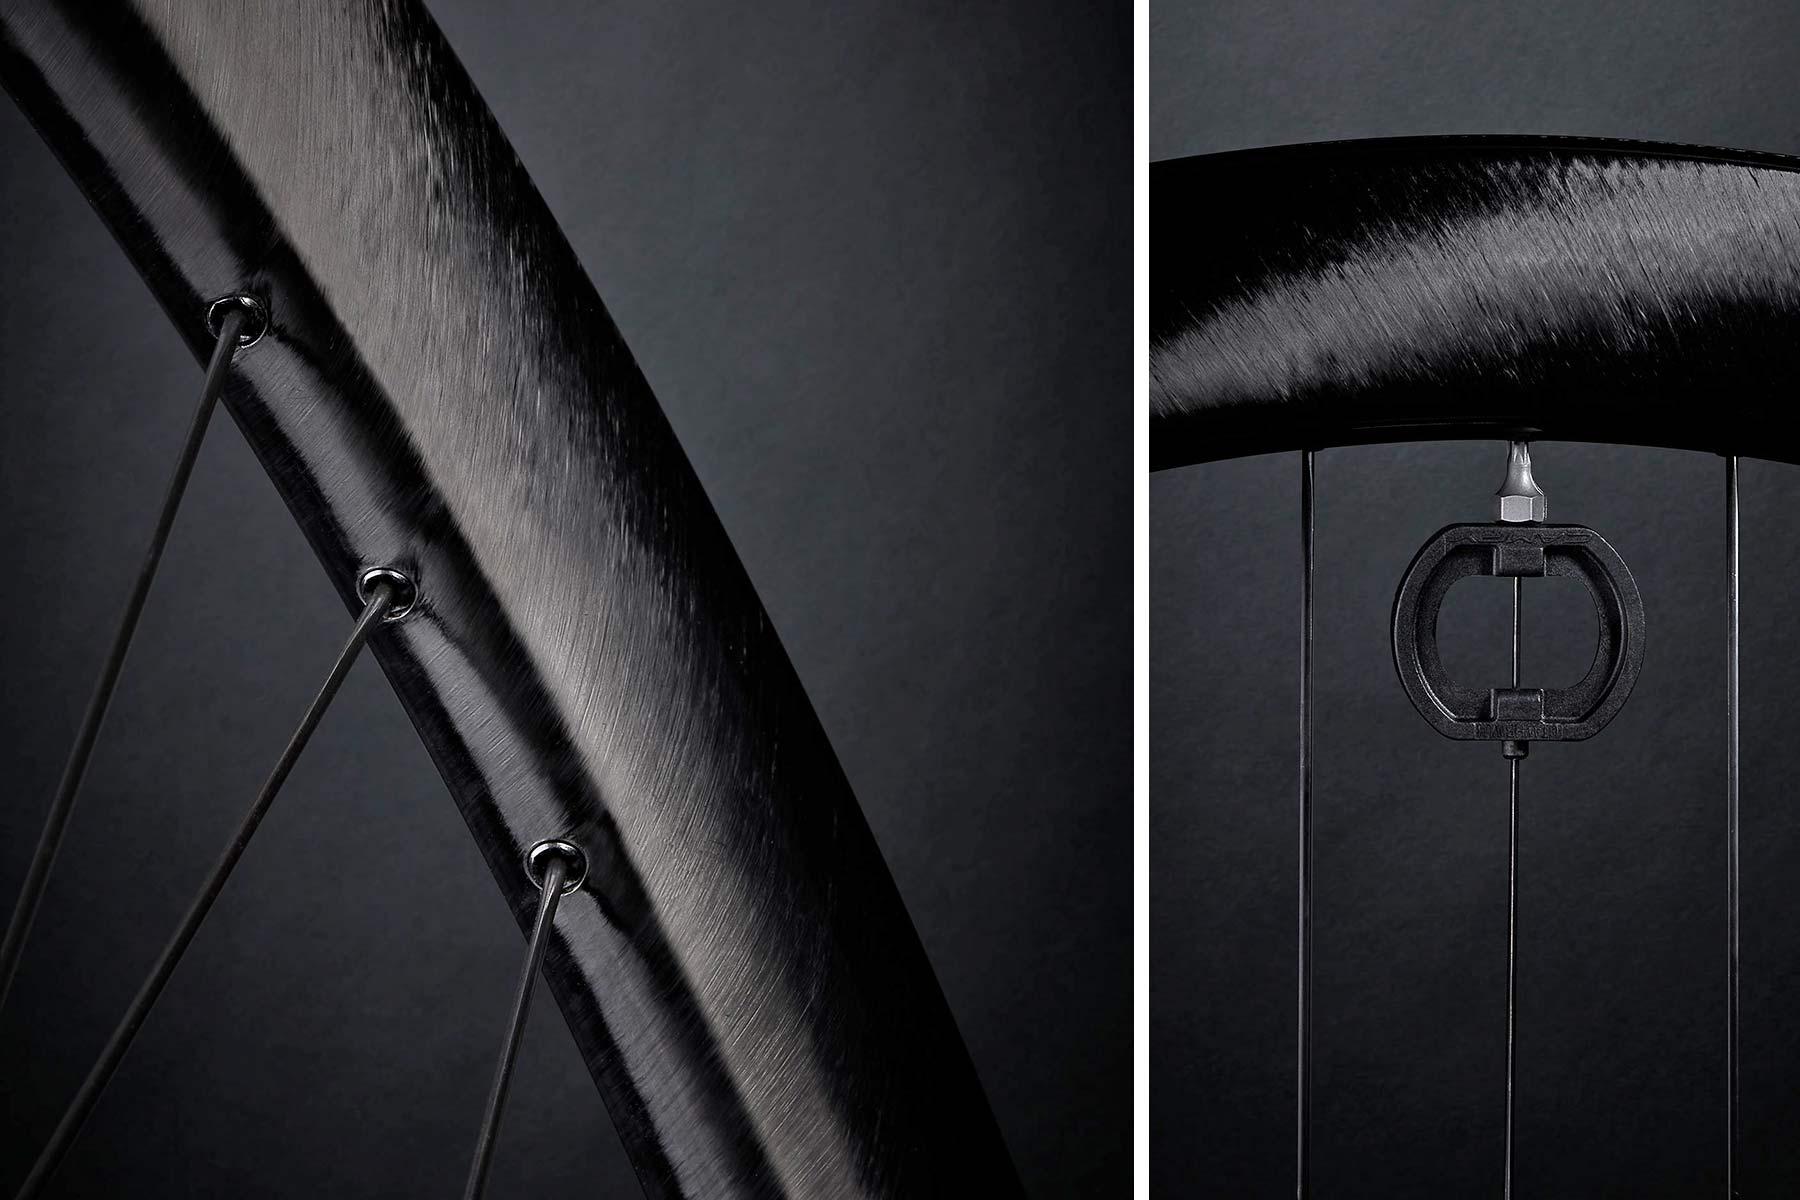 2021 Campagnolo Bora Ultra WTO aero carbon road bike wheelset, internal nipples